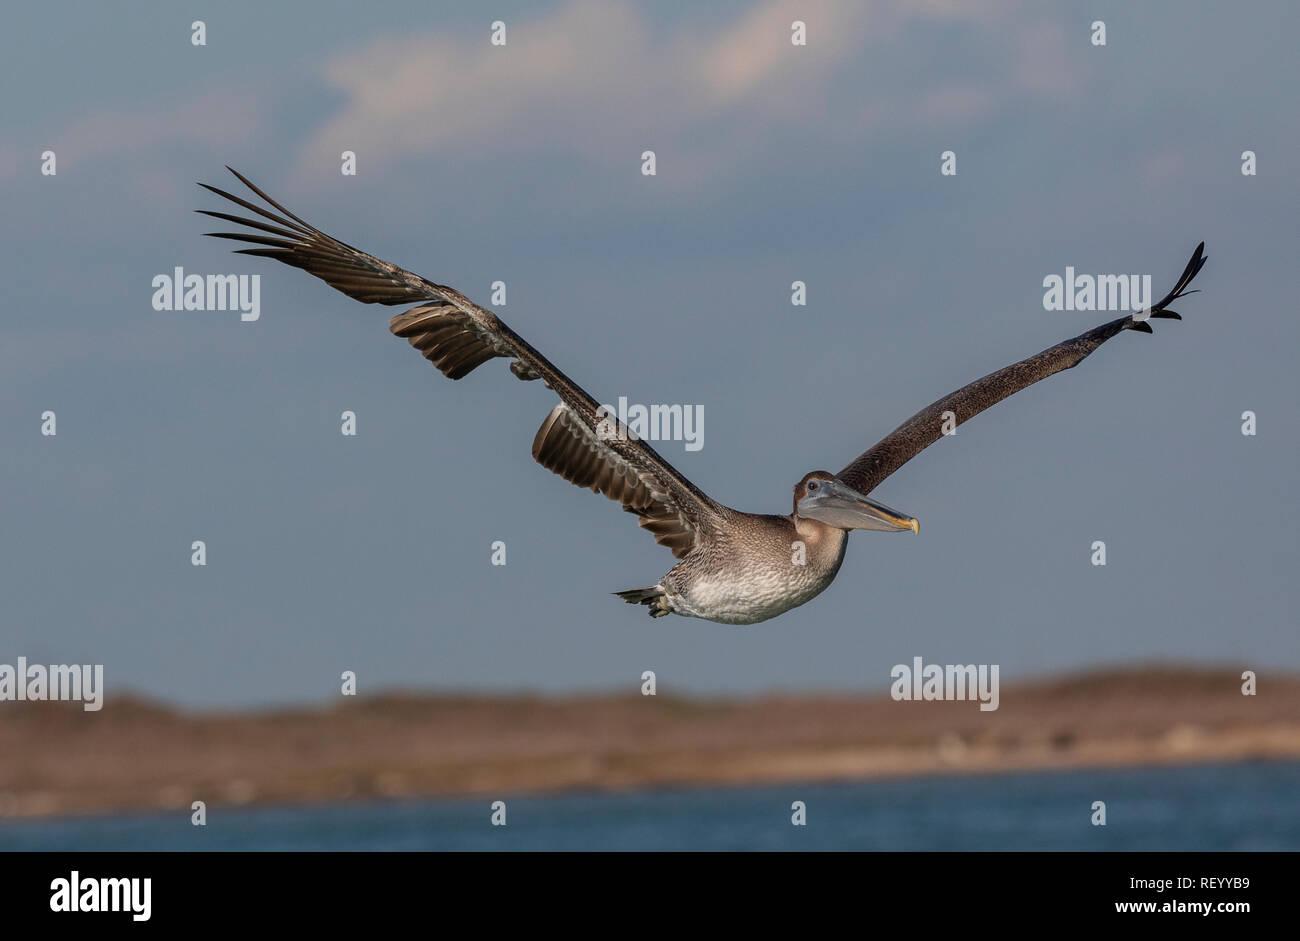 Brown pelican, Pelecanus occidentalis, in flight, Texas coast. Stock Photo